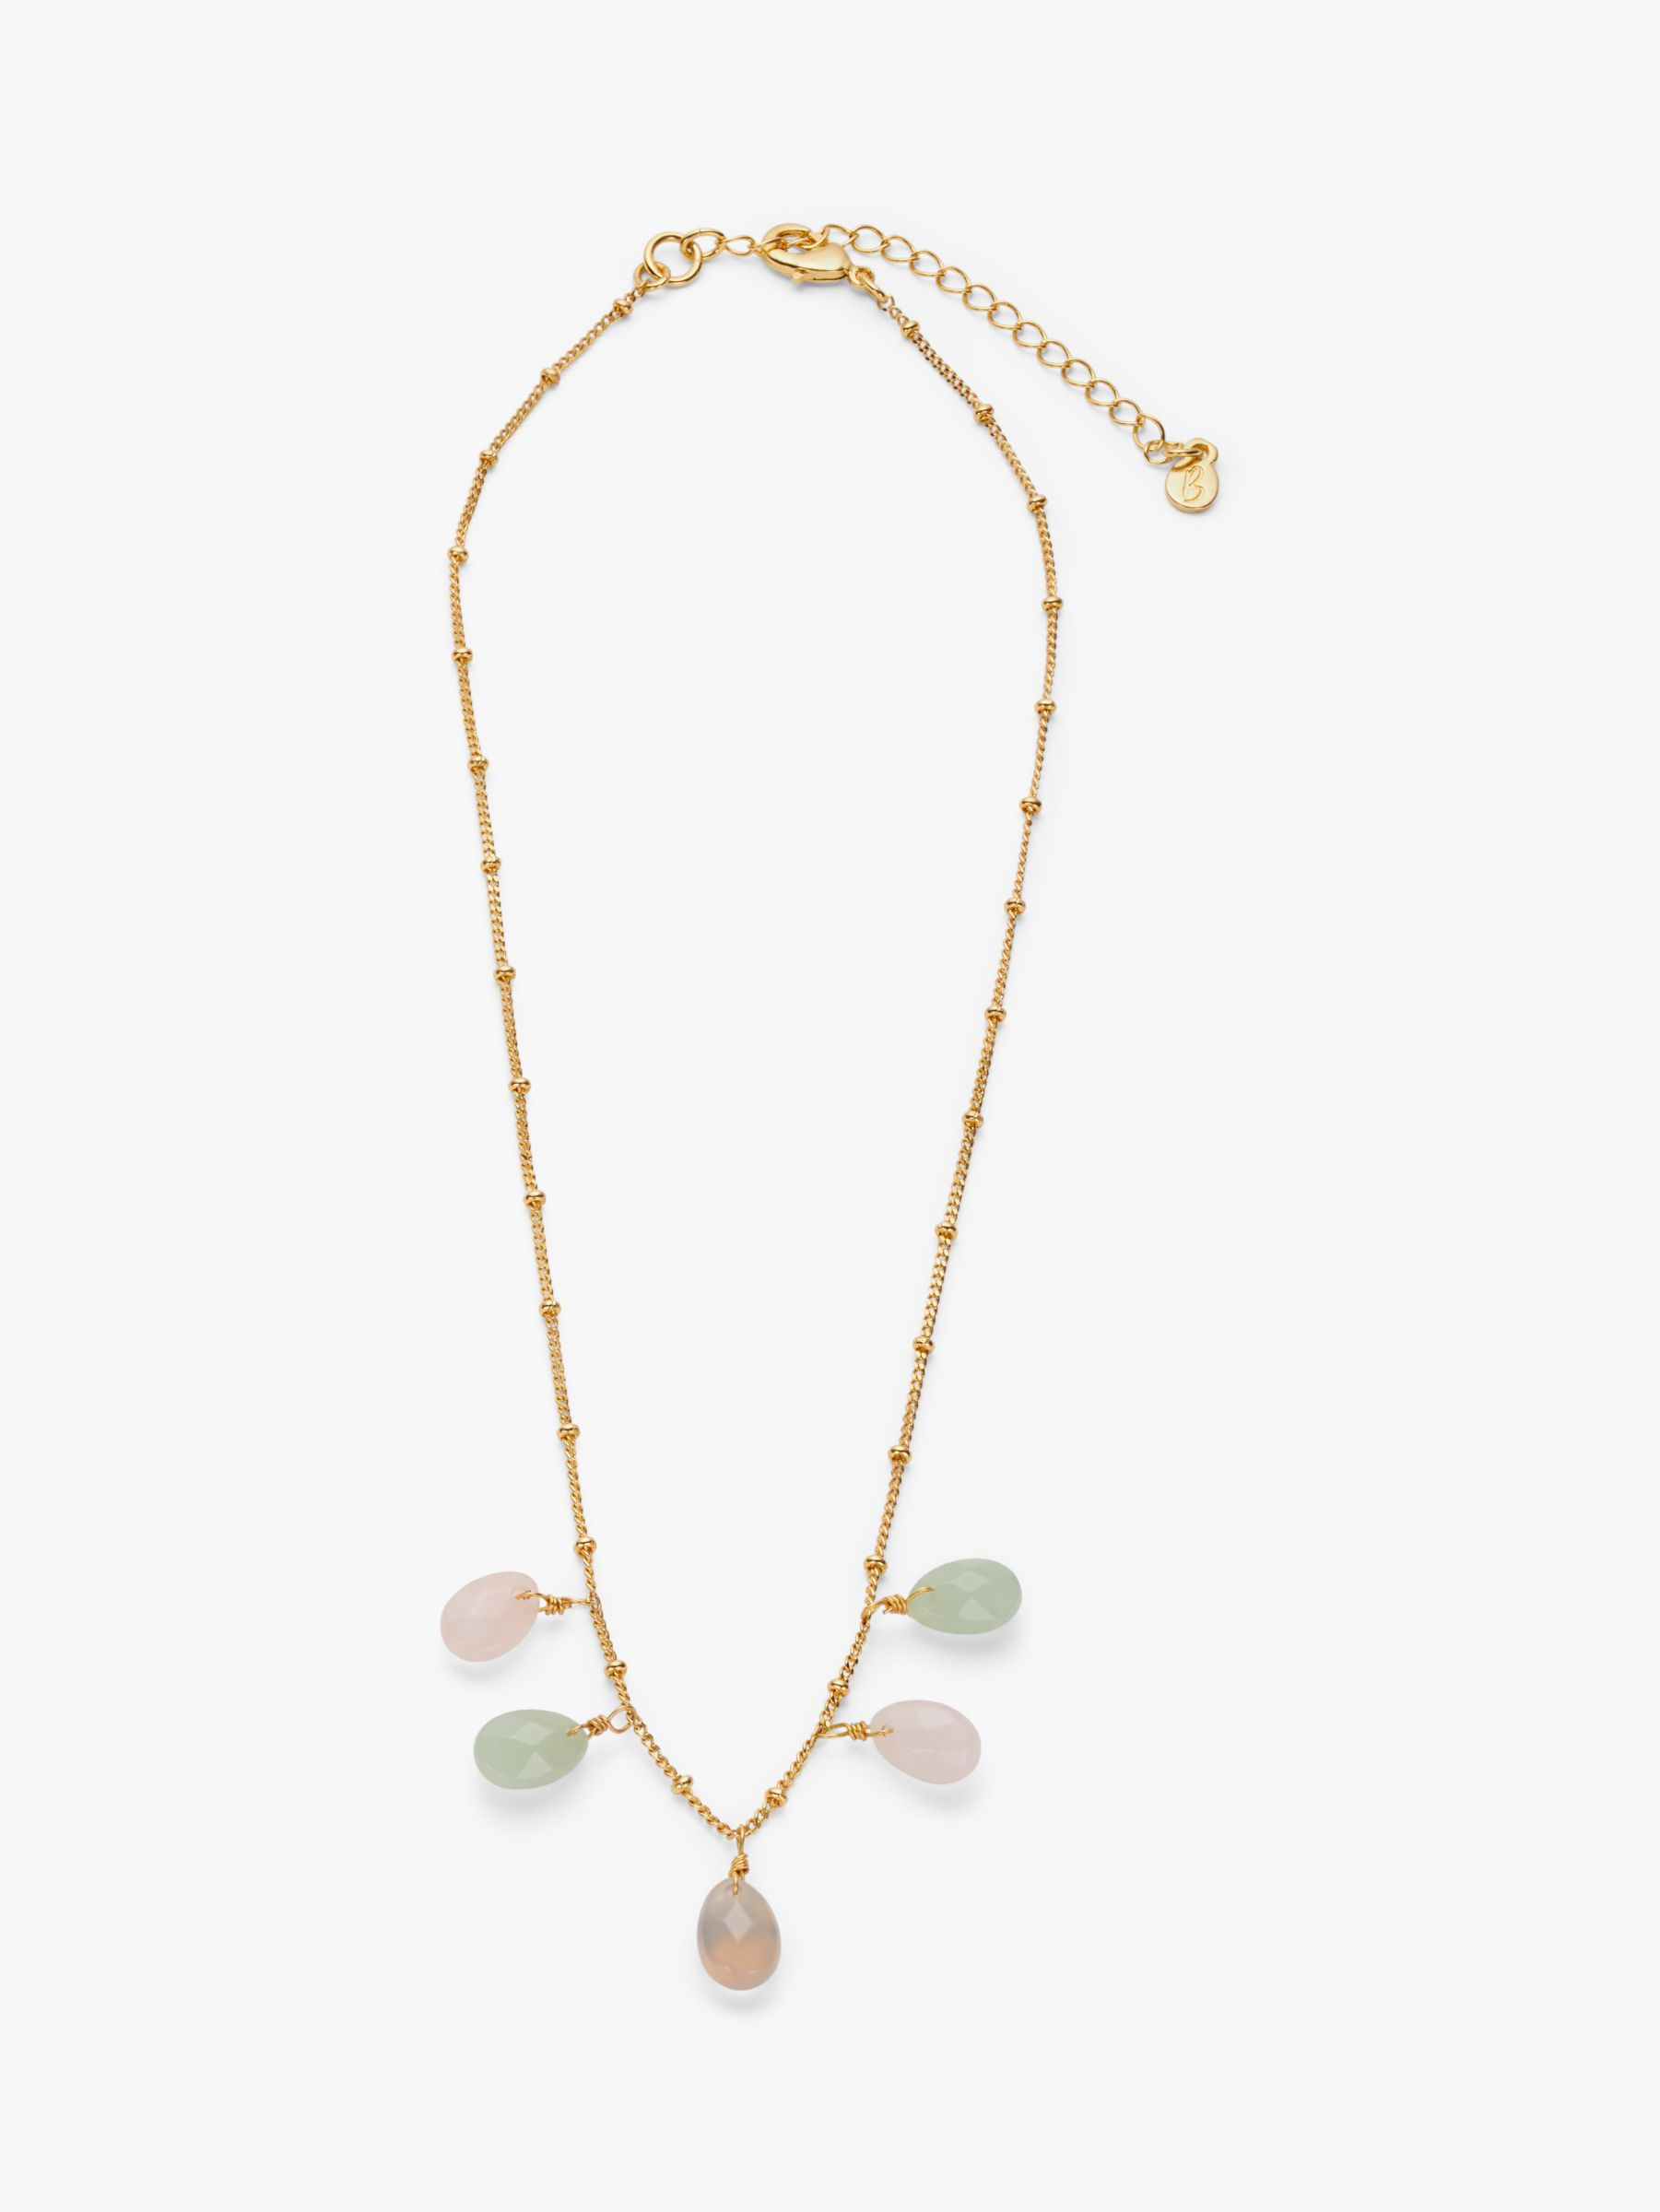 Boden Boden Semi Precious Stones Necklace, Gold